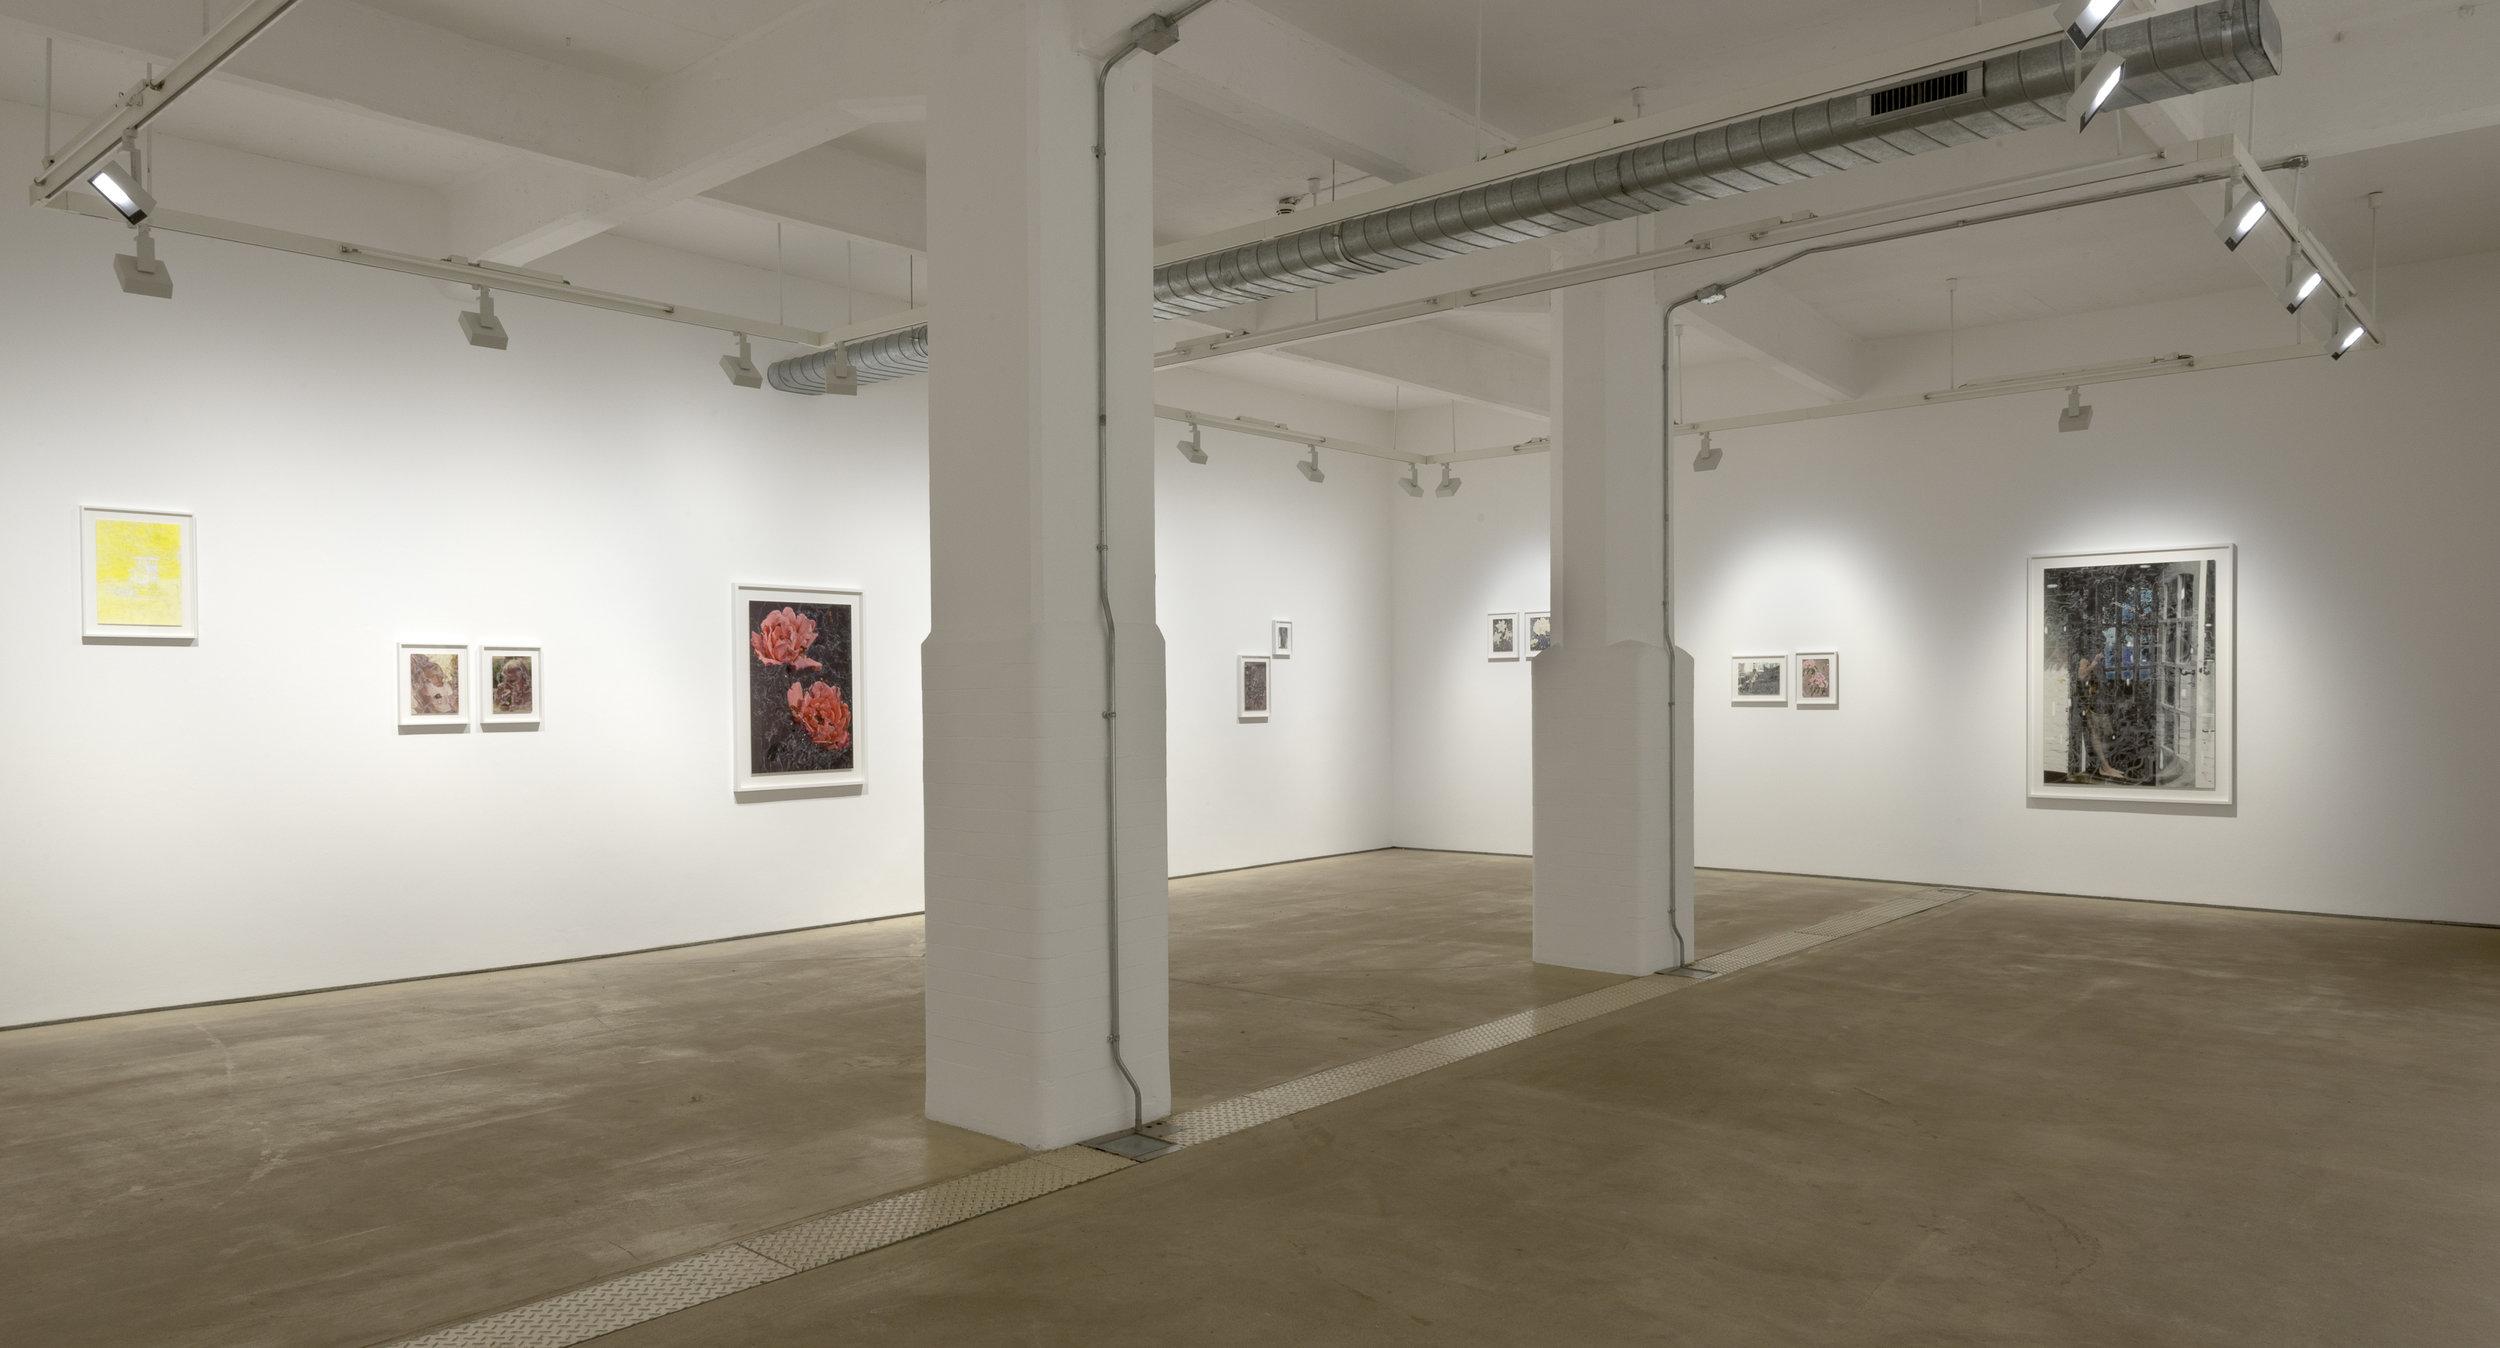 Sebastiaan Bremer, Here Comes the Sun, 2018, Hales London, view 1.jpg